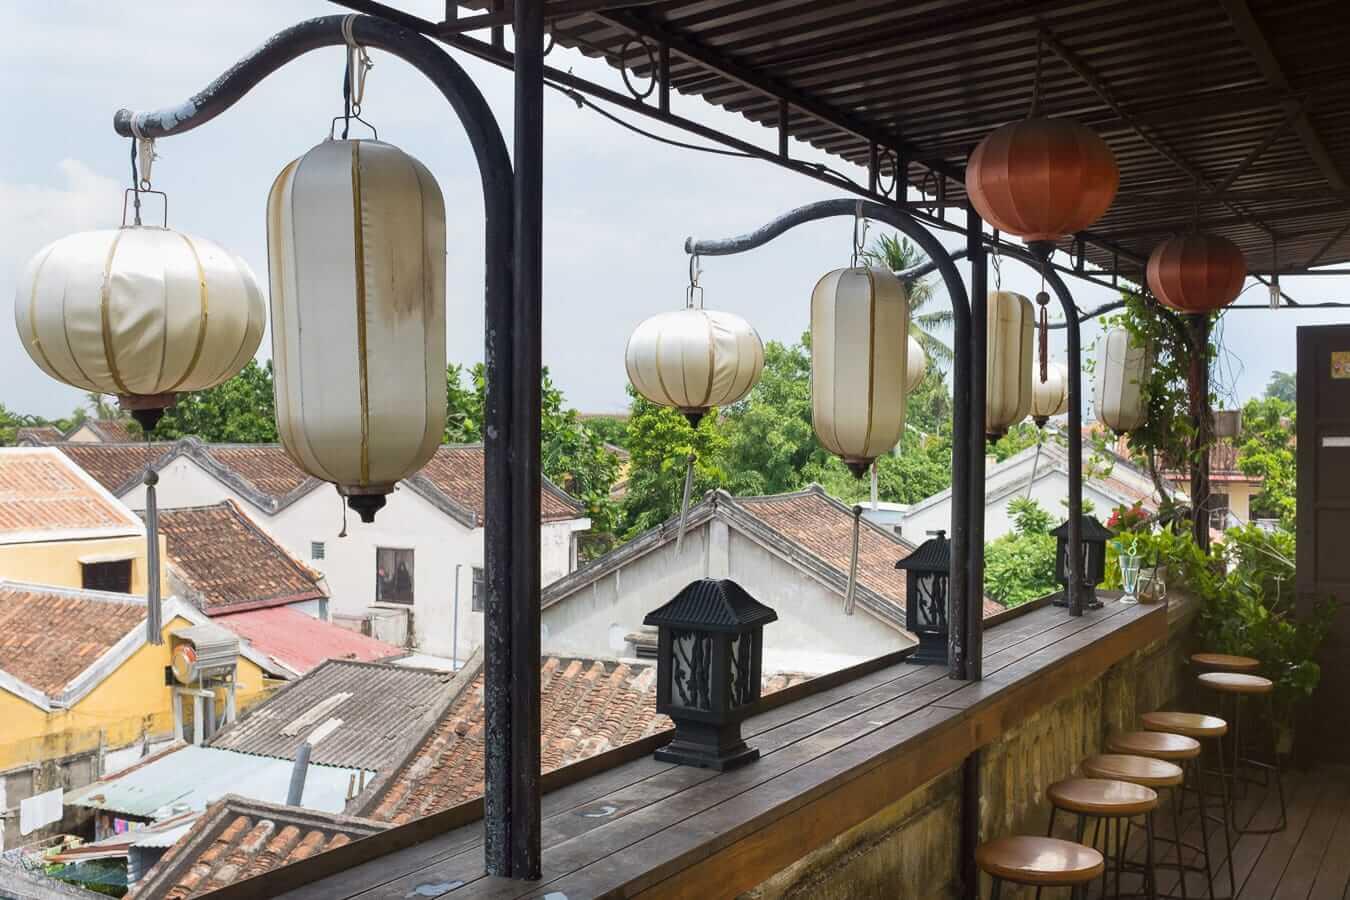 Faifo Coffee: 3-day itinerary in Hoi An